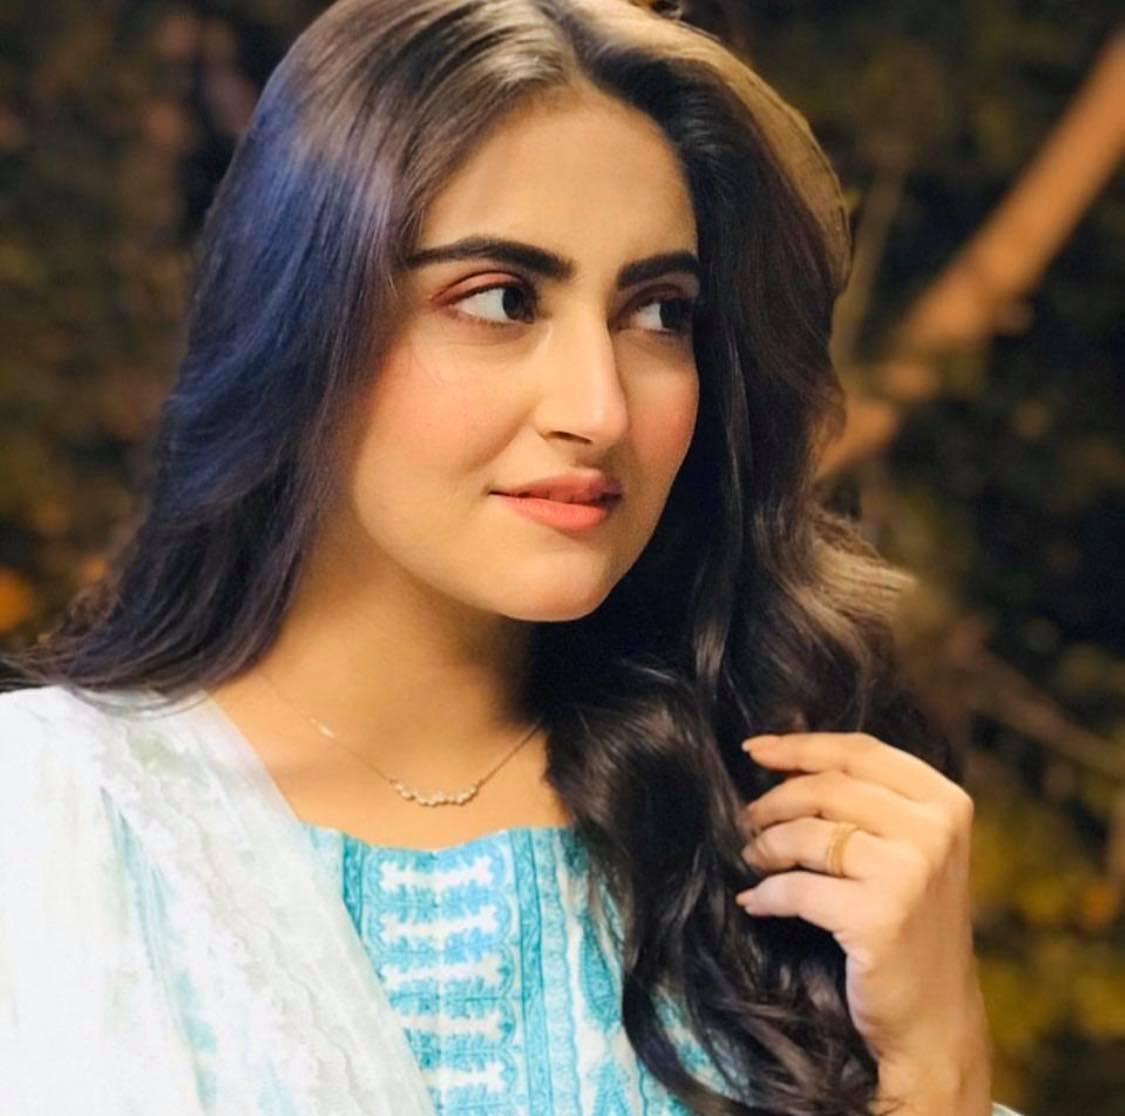 Top 10 Most Promising New Pakistani Actors